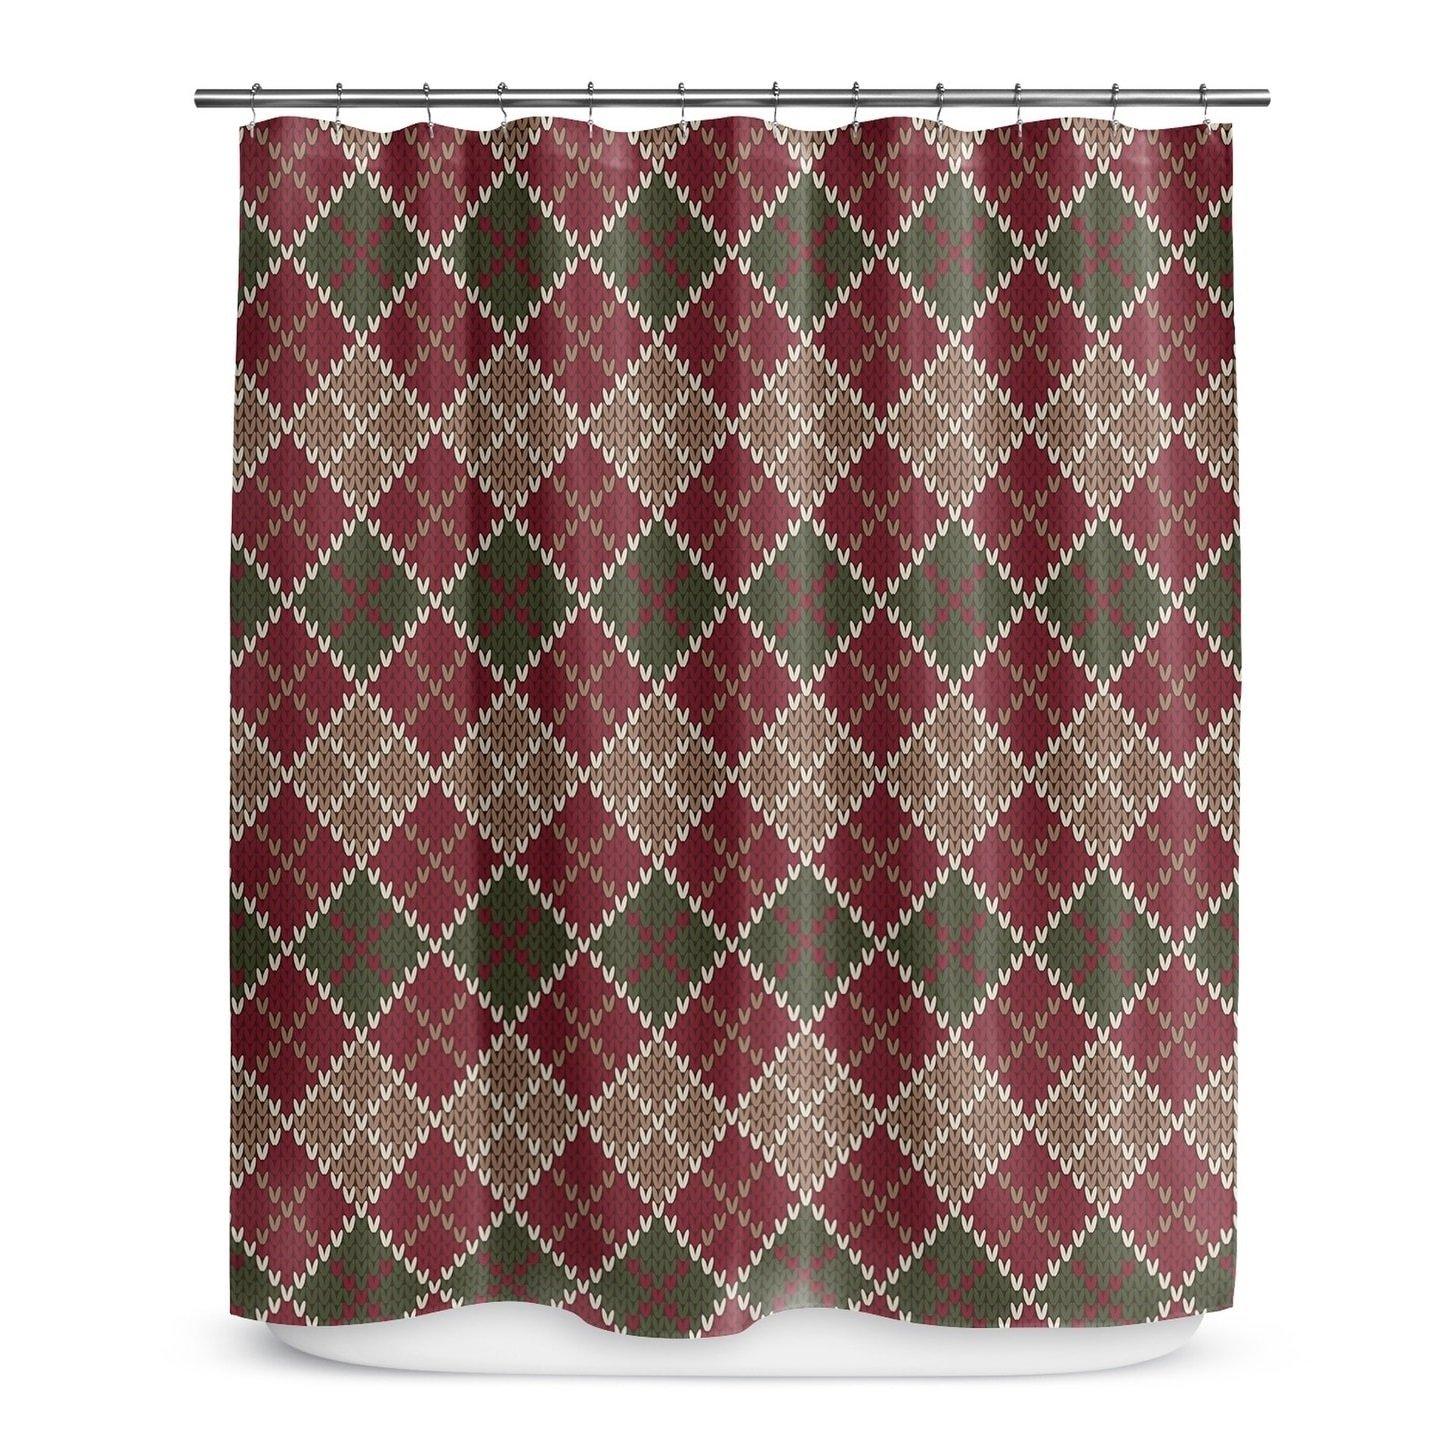 Earthy Geometric Diamonds Design, Western Top Shower Curtain, Printed Geo Diamonds Cubes Themed, Premium Modern Home Kids Bathroom Decoration, Bold Trendy Country Style, Burgundy, Green, Size 70 x 72